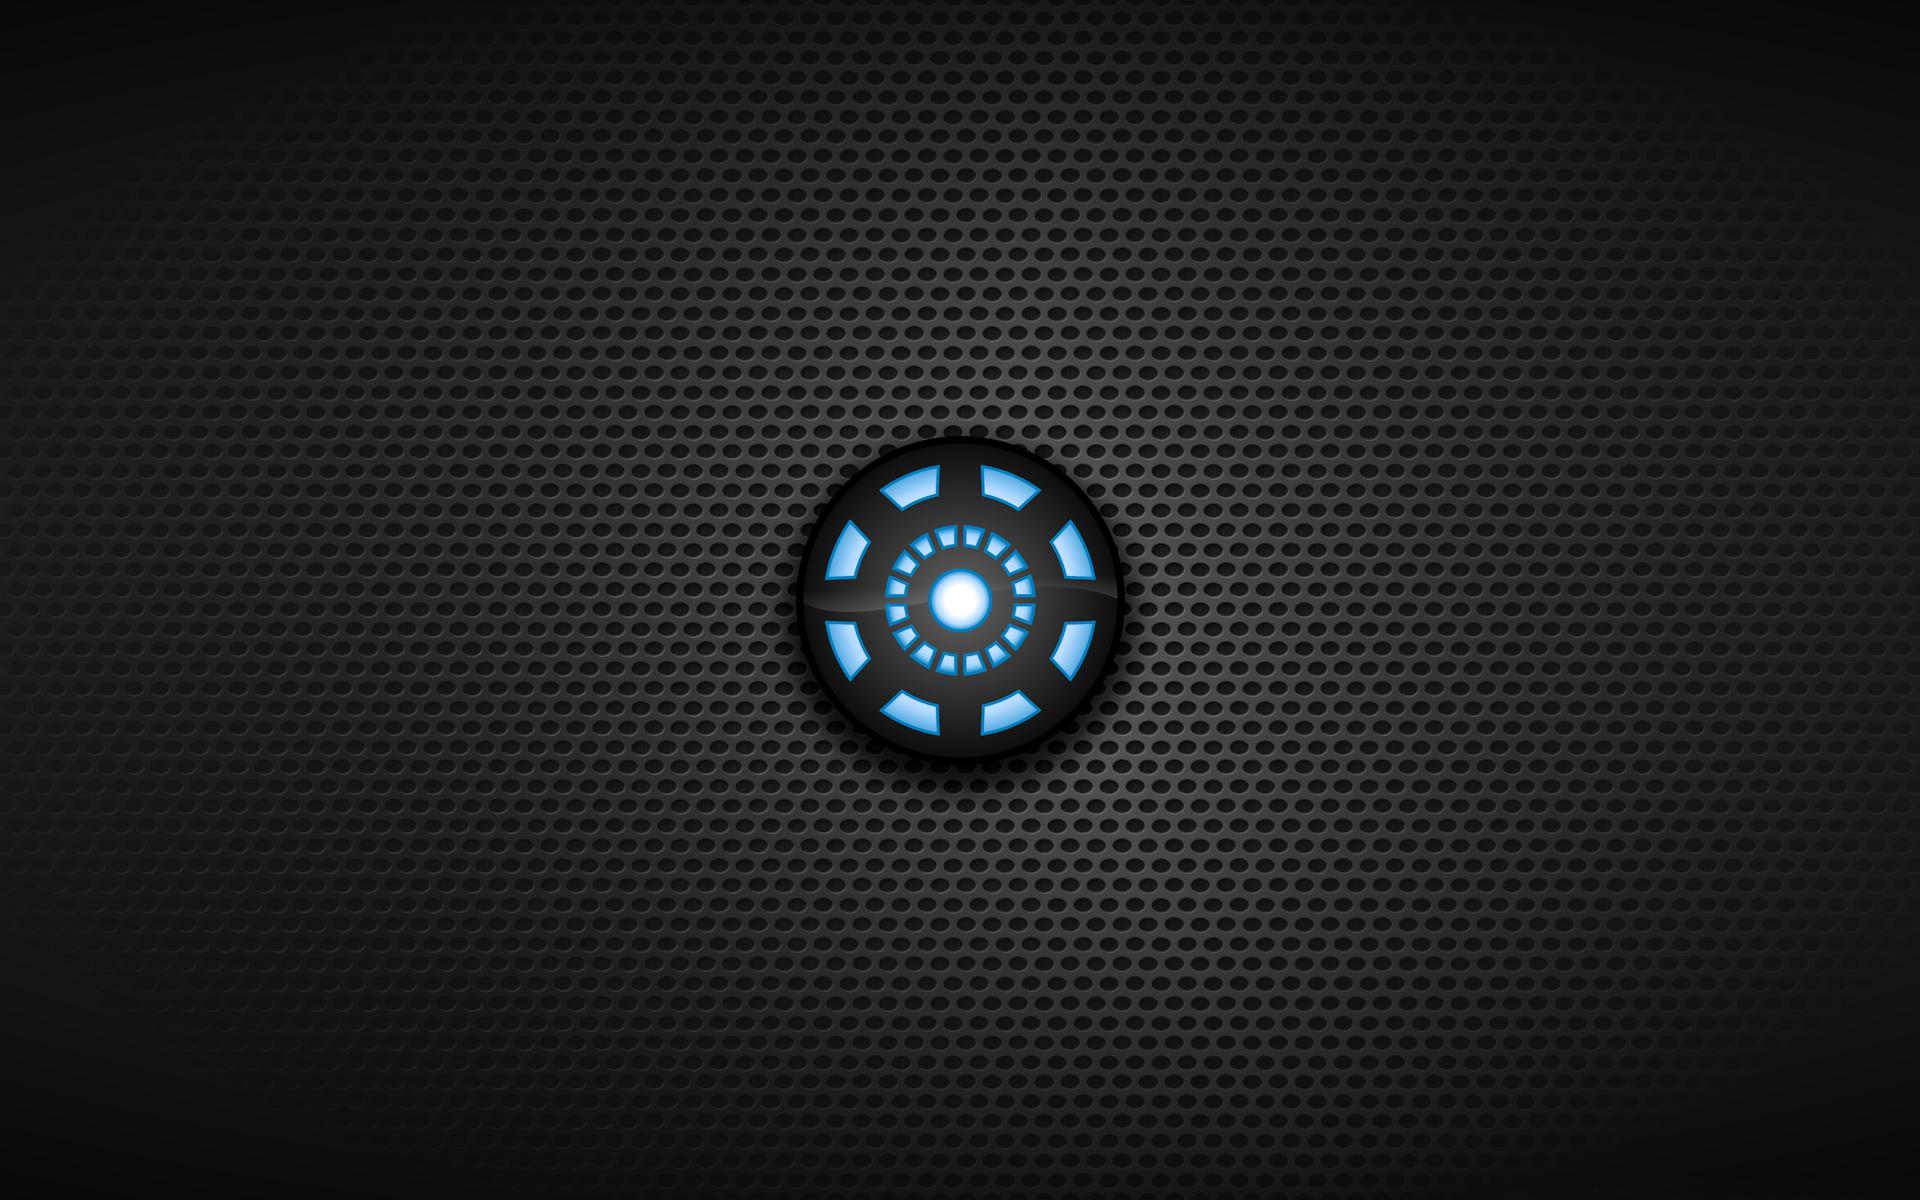 Iron Man Logo Wallpapers - Wallpaper Cave